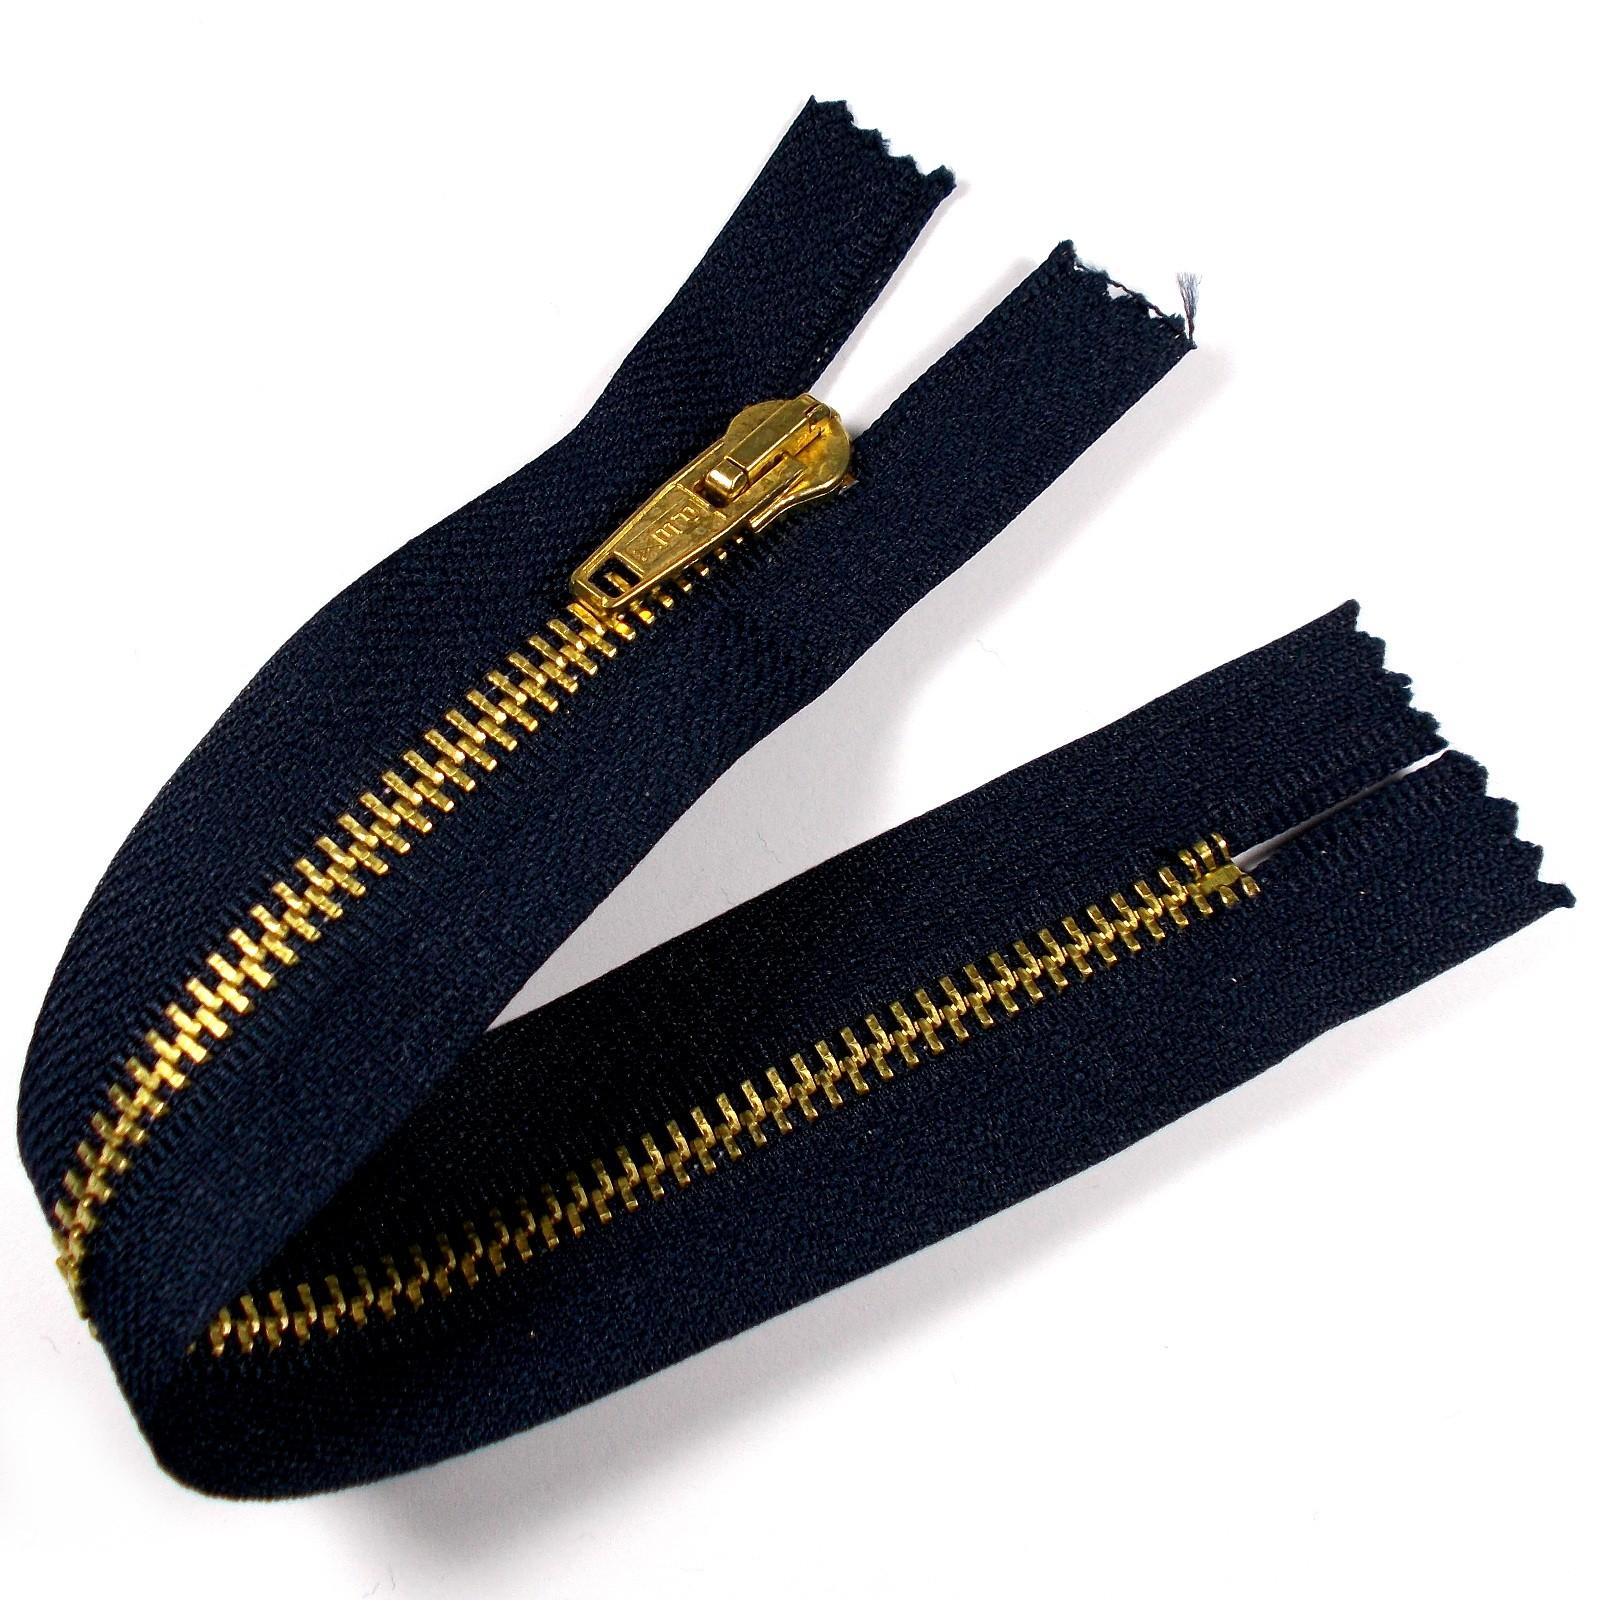 Gold Metal Trouser Jeans Zip Zipper 5 inch Dark Blue